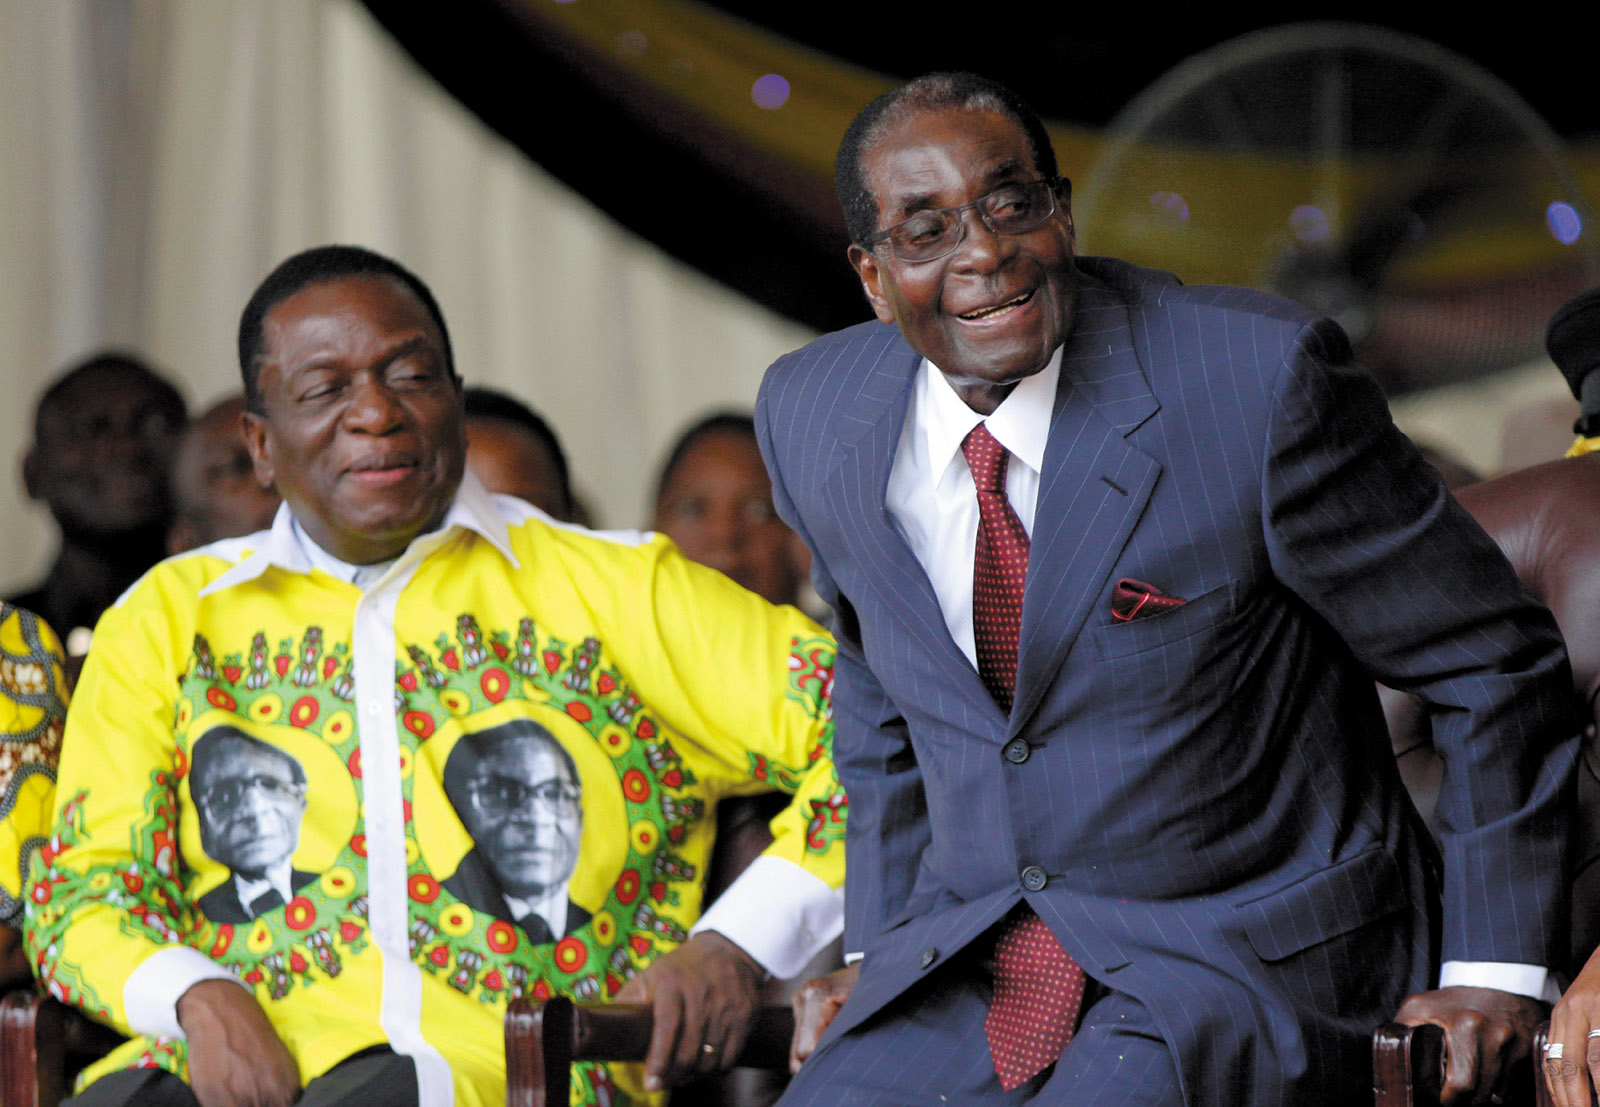 Zimbabwean Vice President Emmerson Mnangagwa and President Robert Mugabe at Mugabe's ninety-second birthday celebrations, Masvingo, Zimbabwe, February 2016